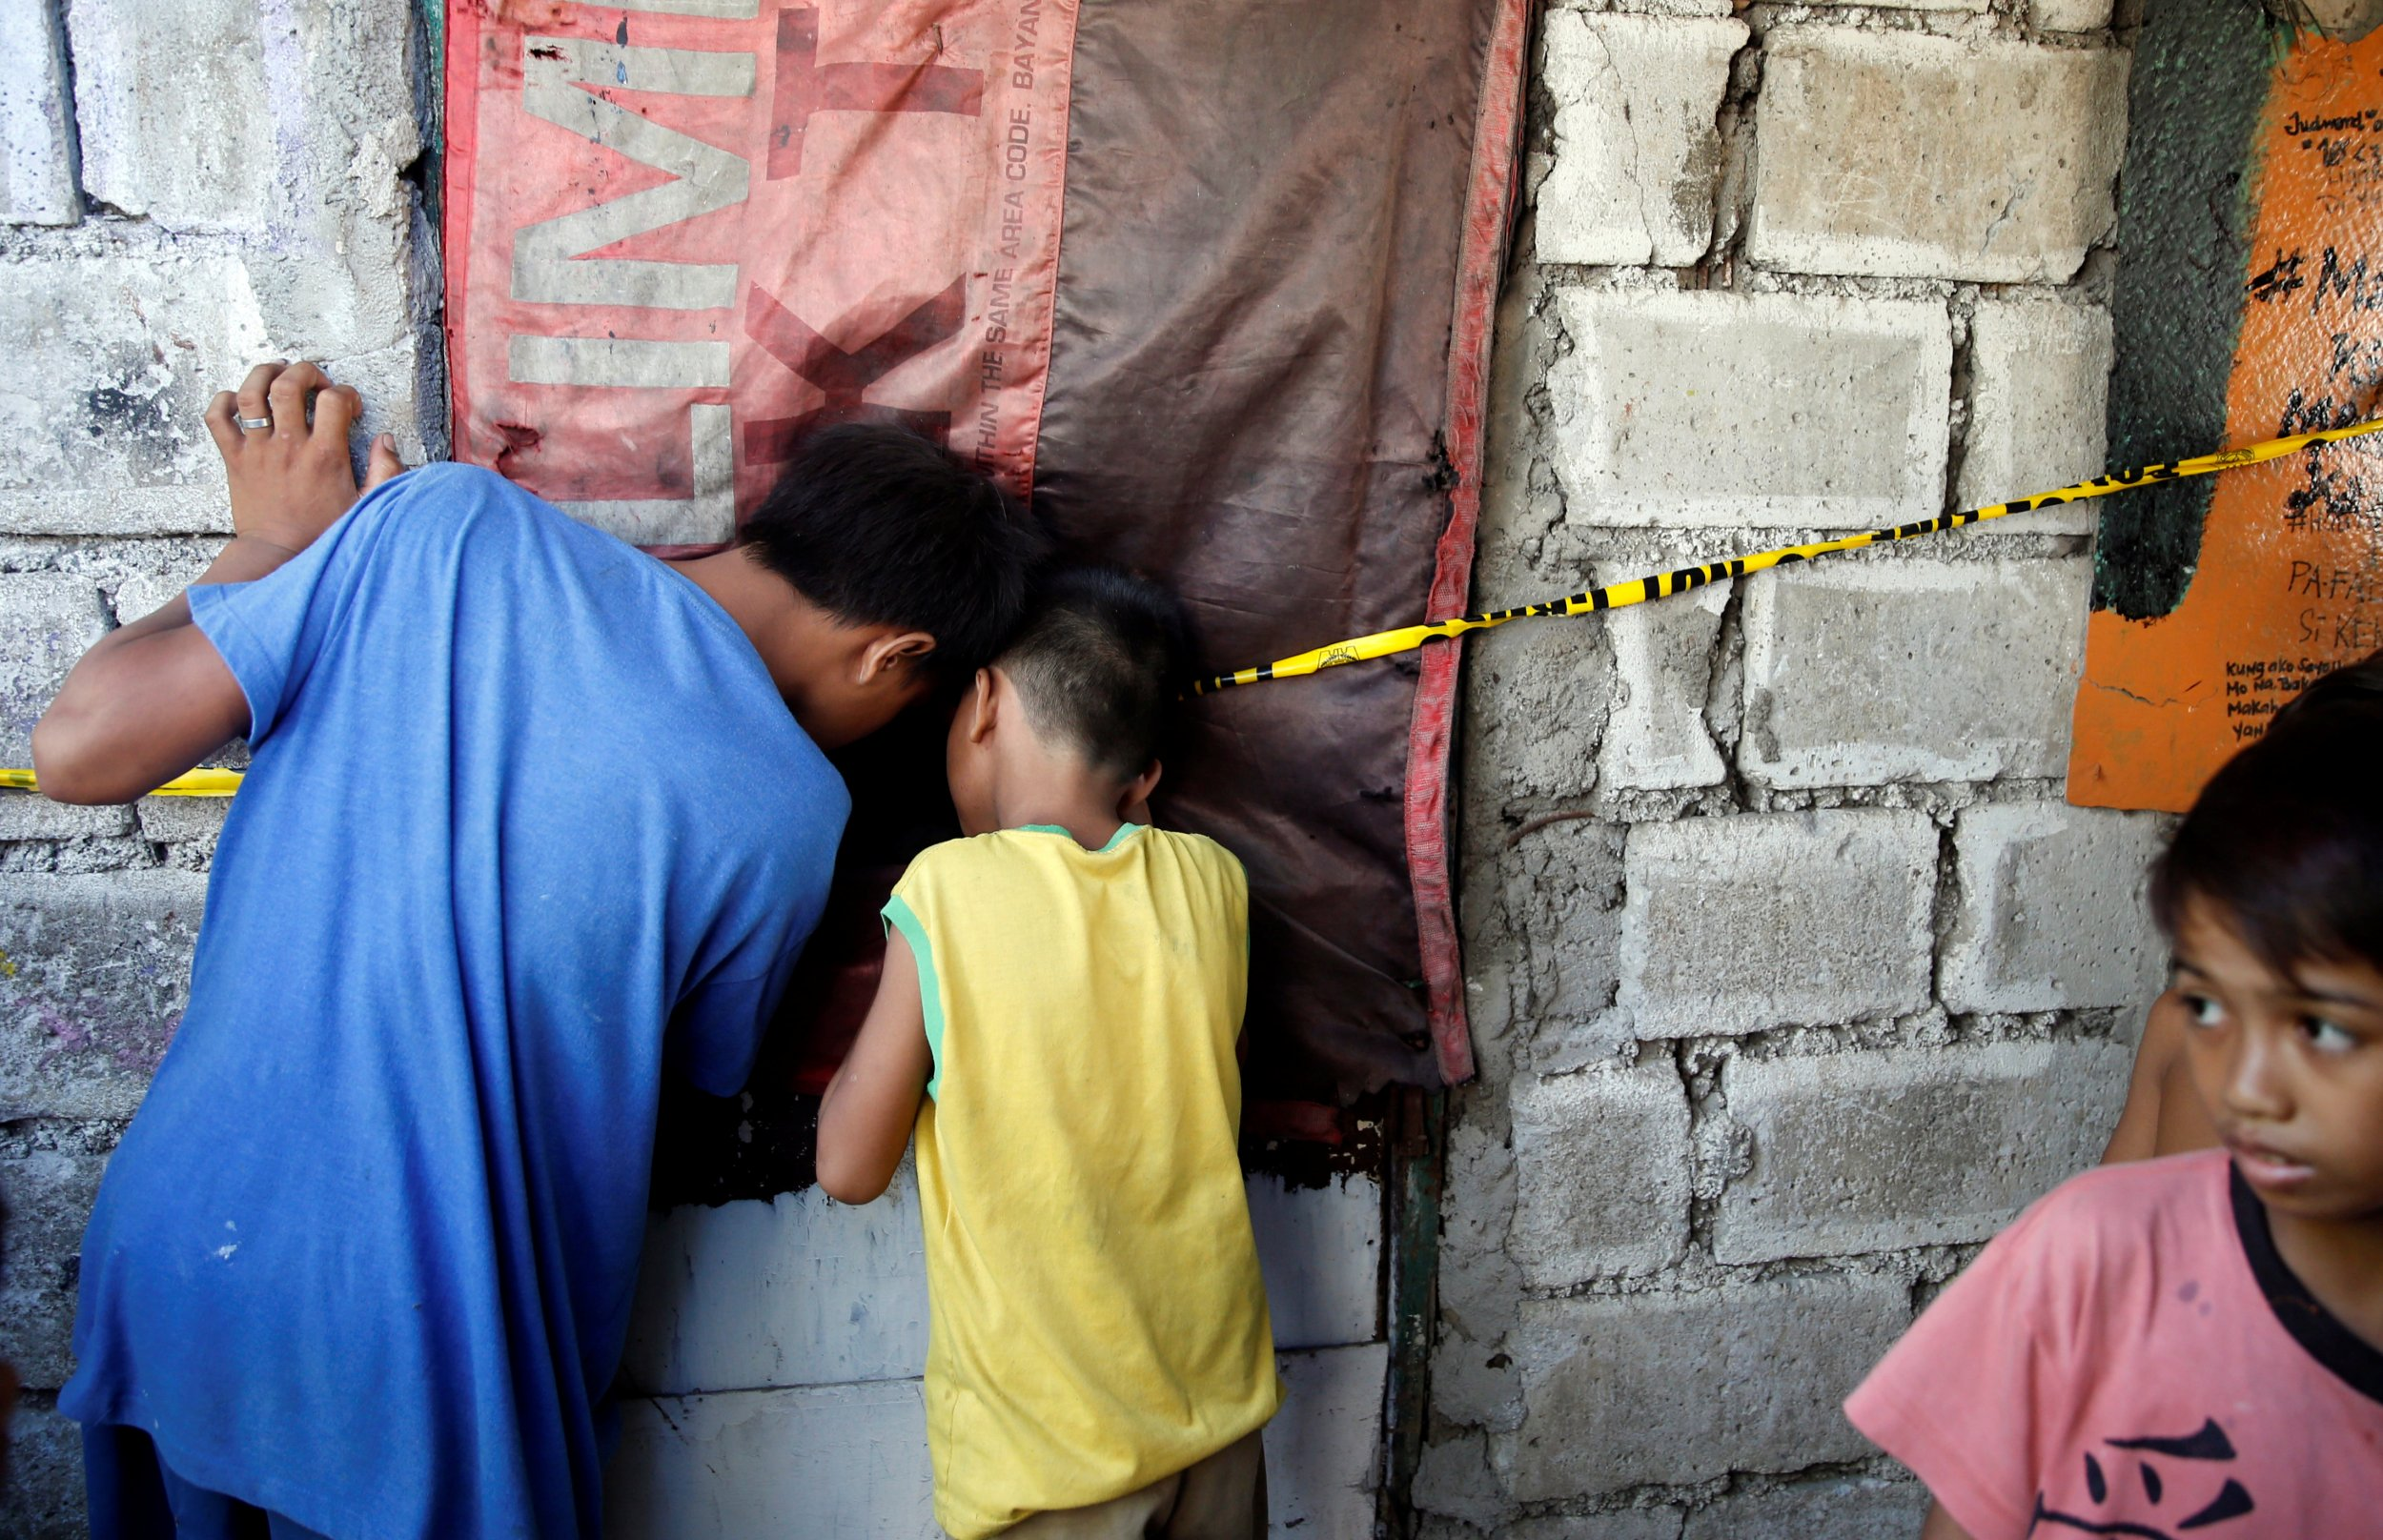 Children look at dead people through hole in drug war